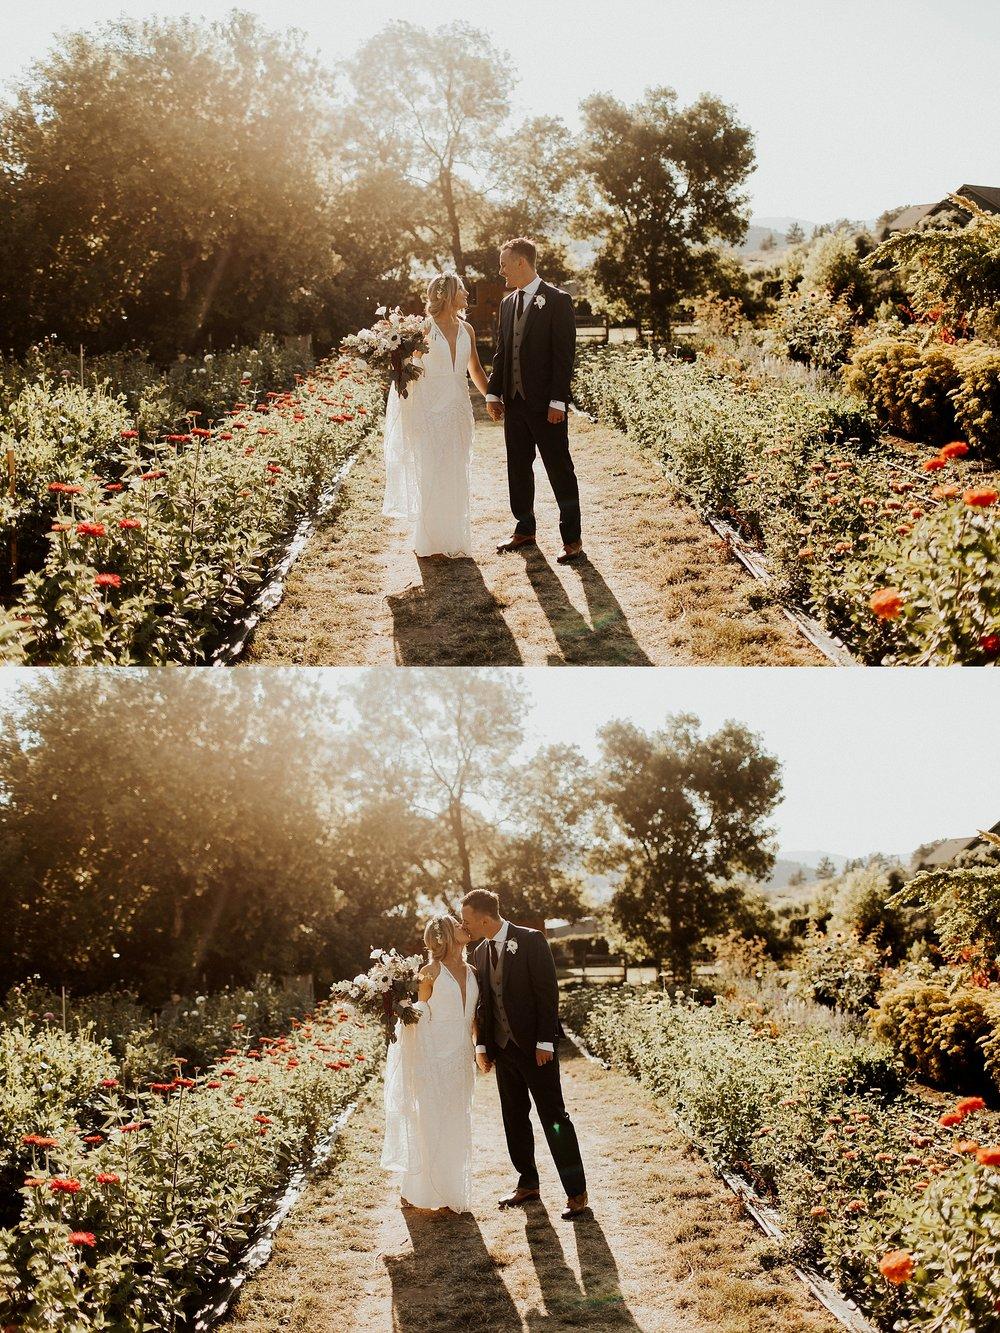 Lyons_Farmette_Wedding_Denver_Colorado_wedding054.JPG